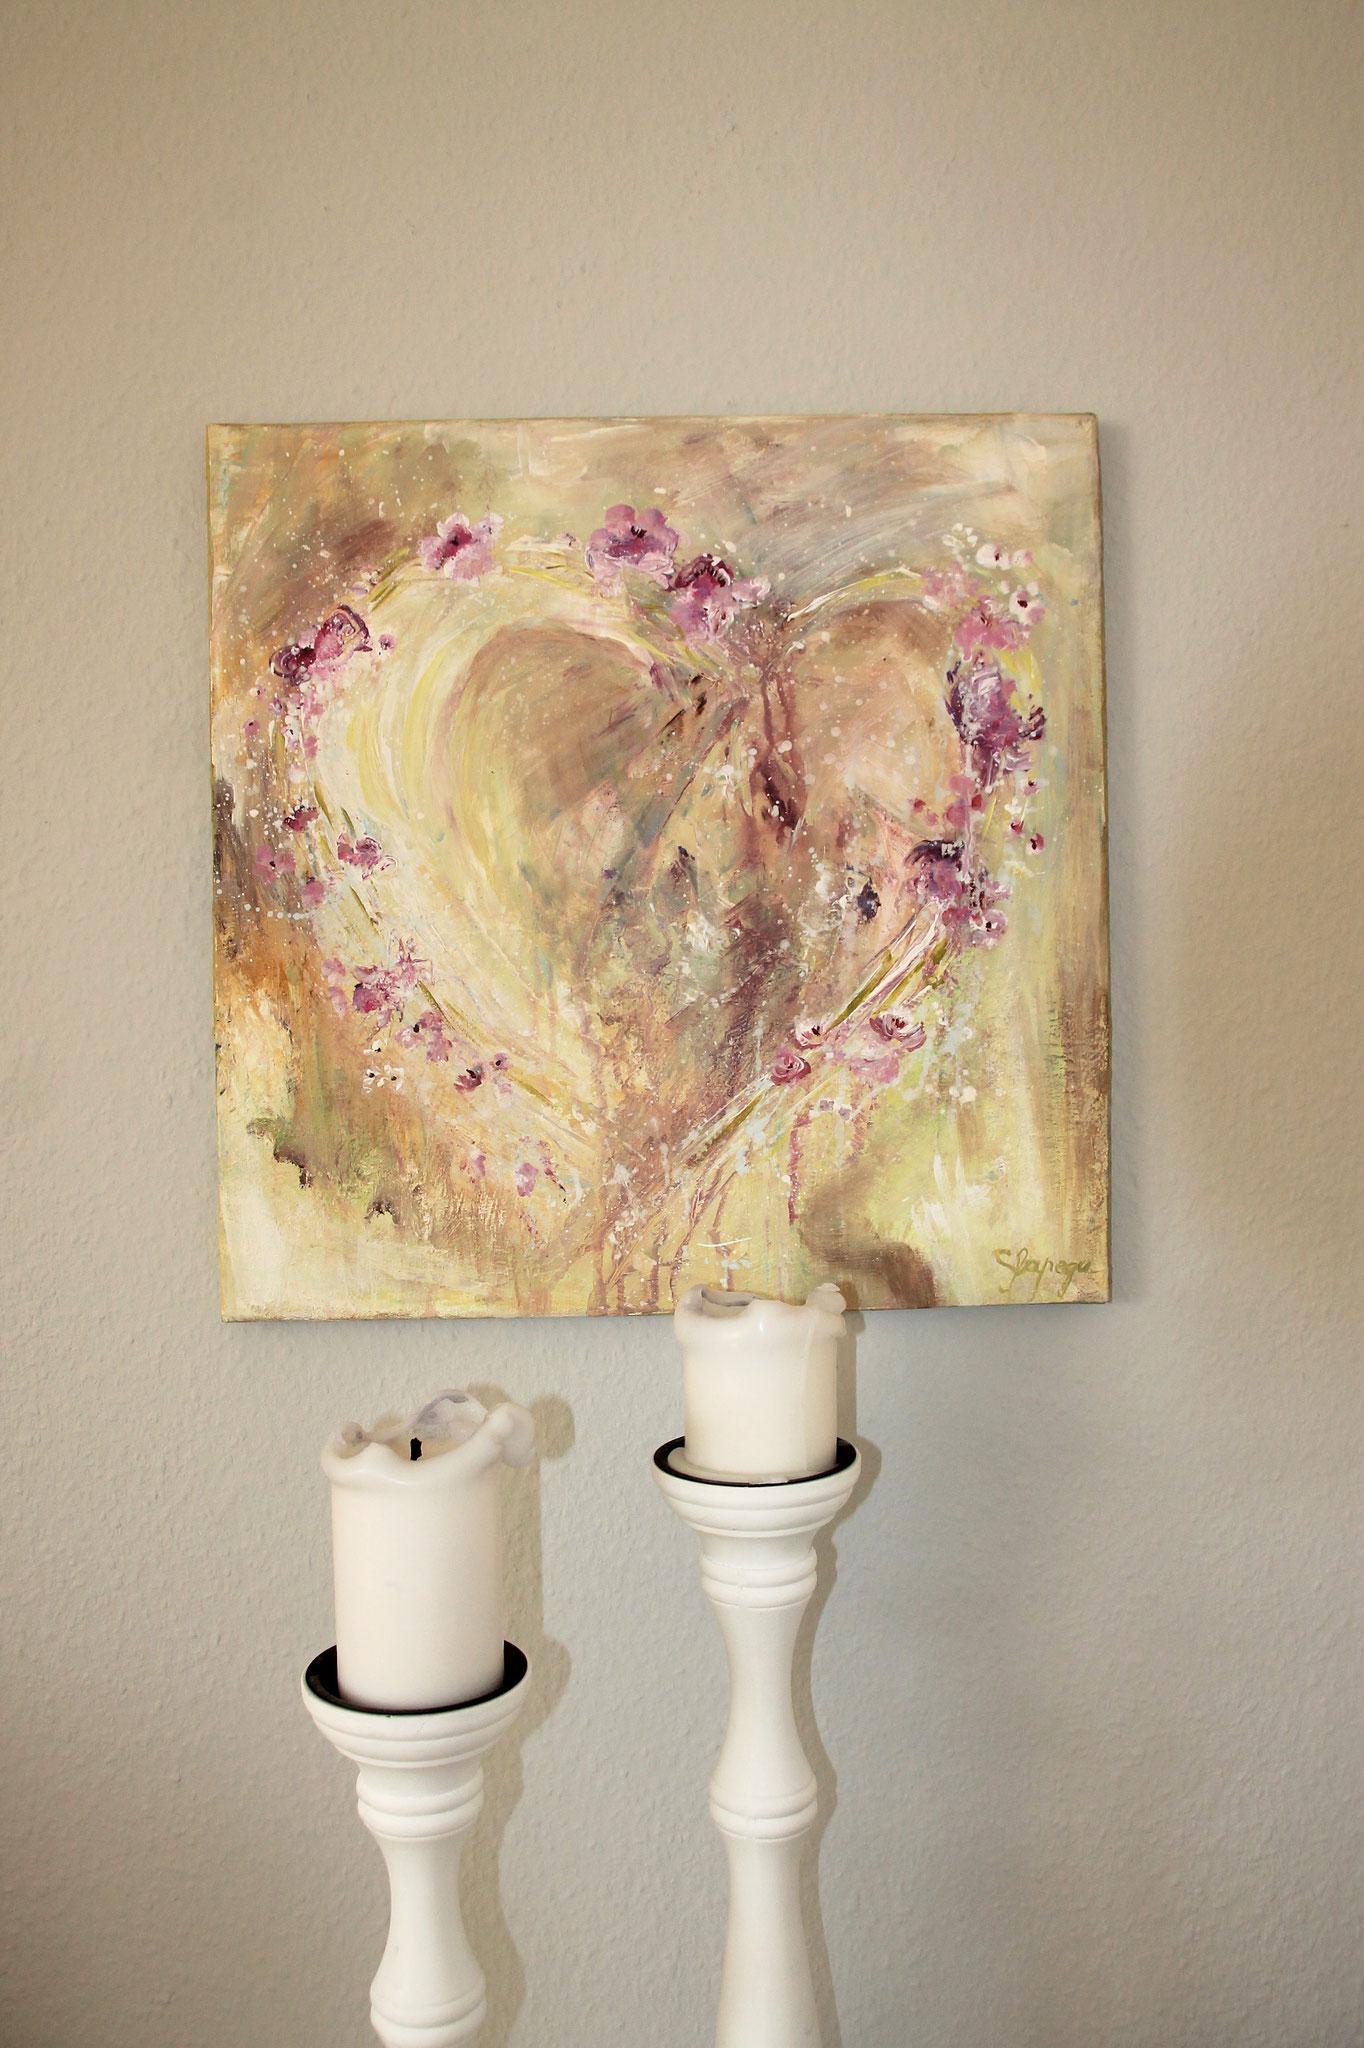 40x 40 cm Acryl auf Leinwand